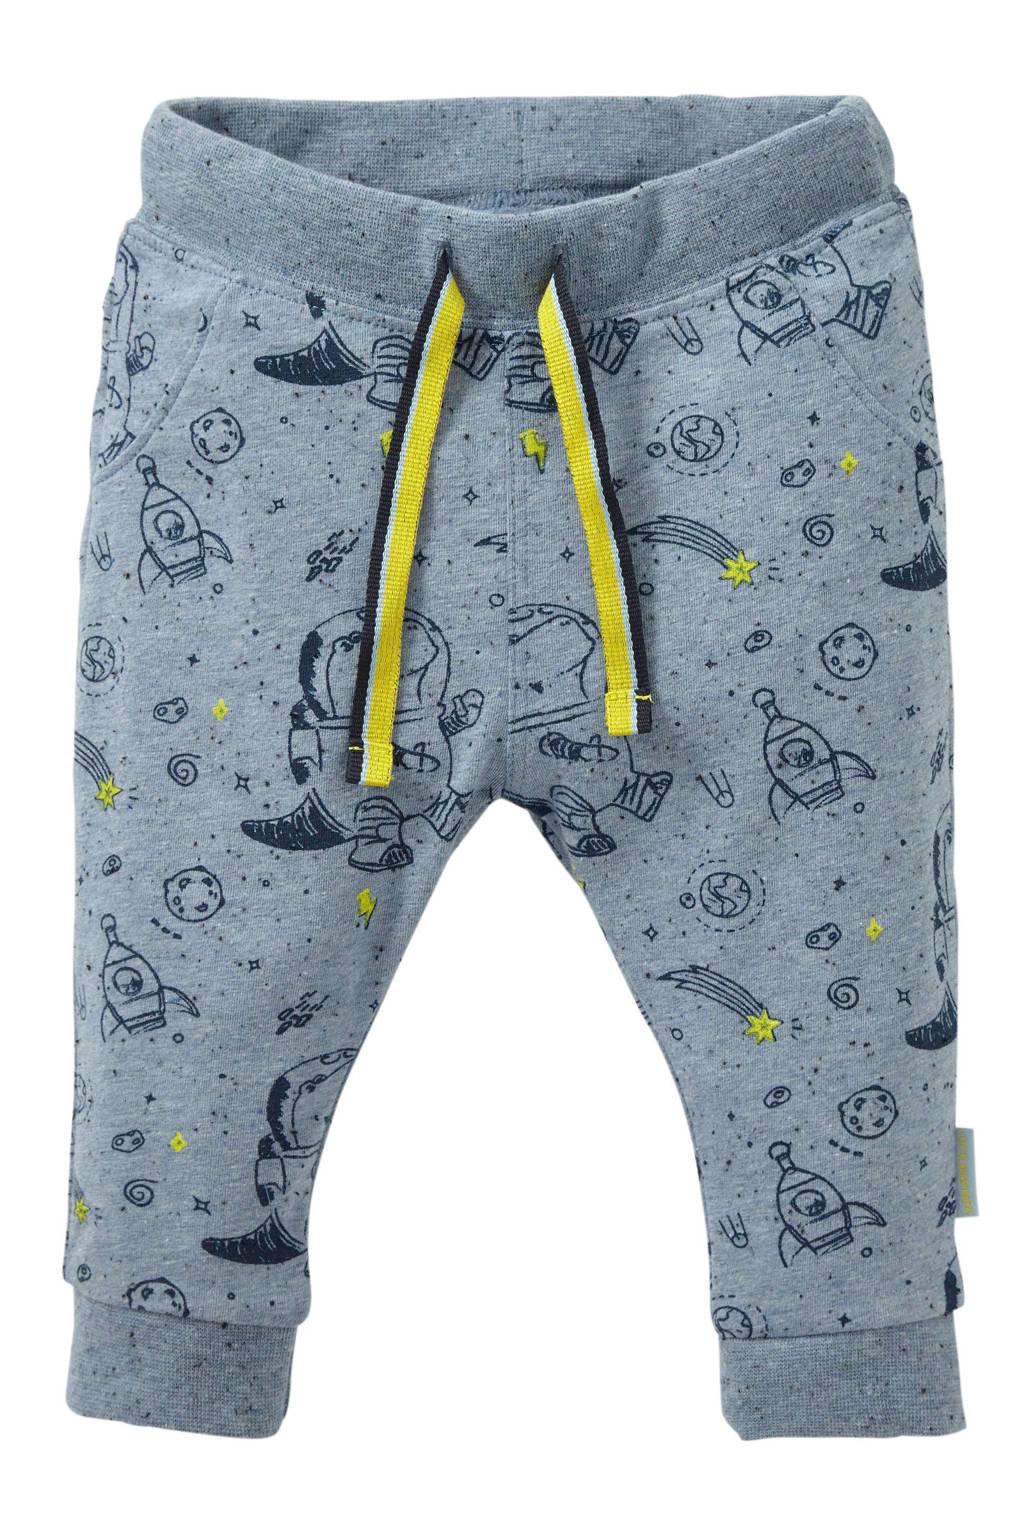 Quapi baby broek Xenno met all over print blauw/donkerblauw, Blauw/donkerblauw